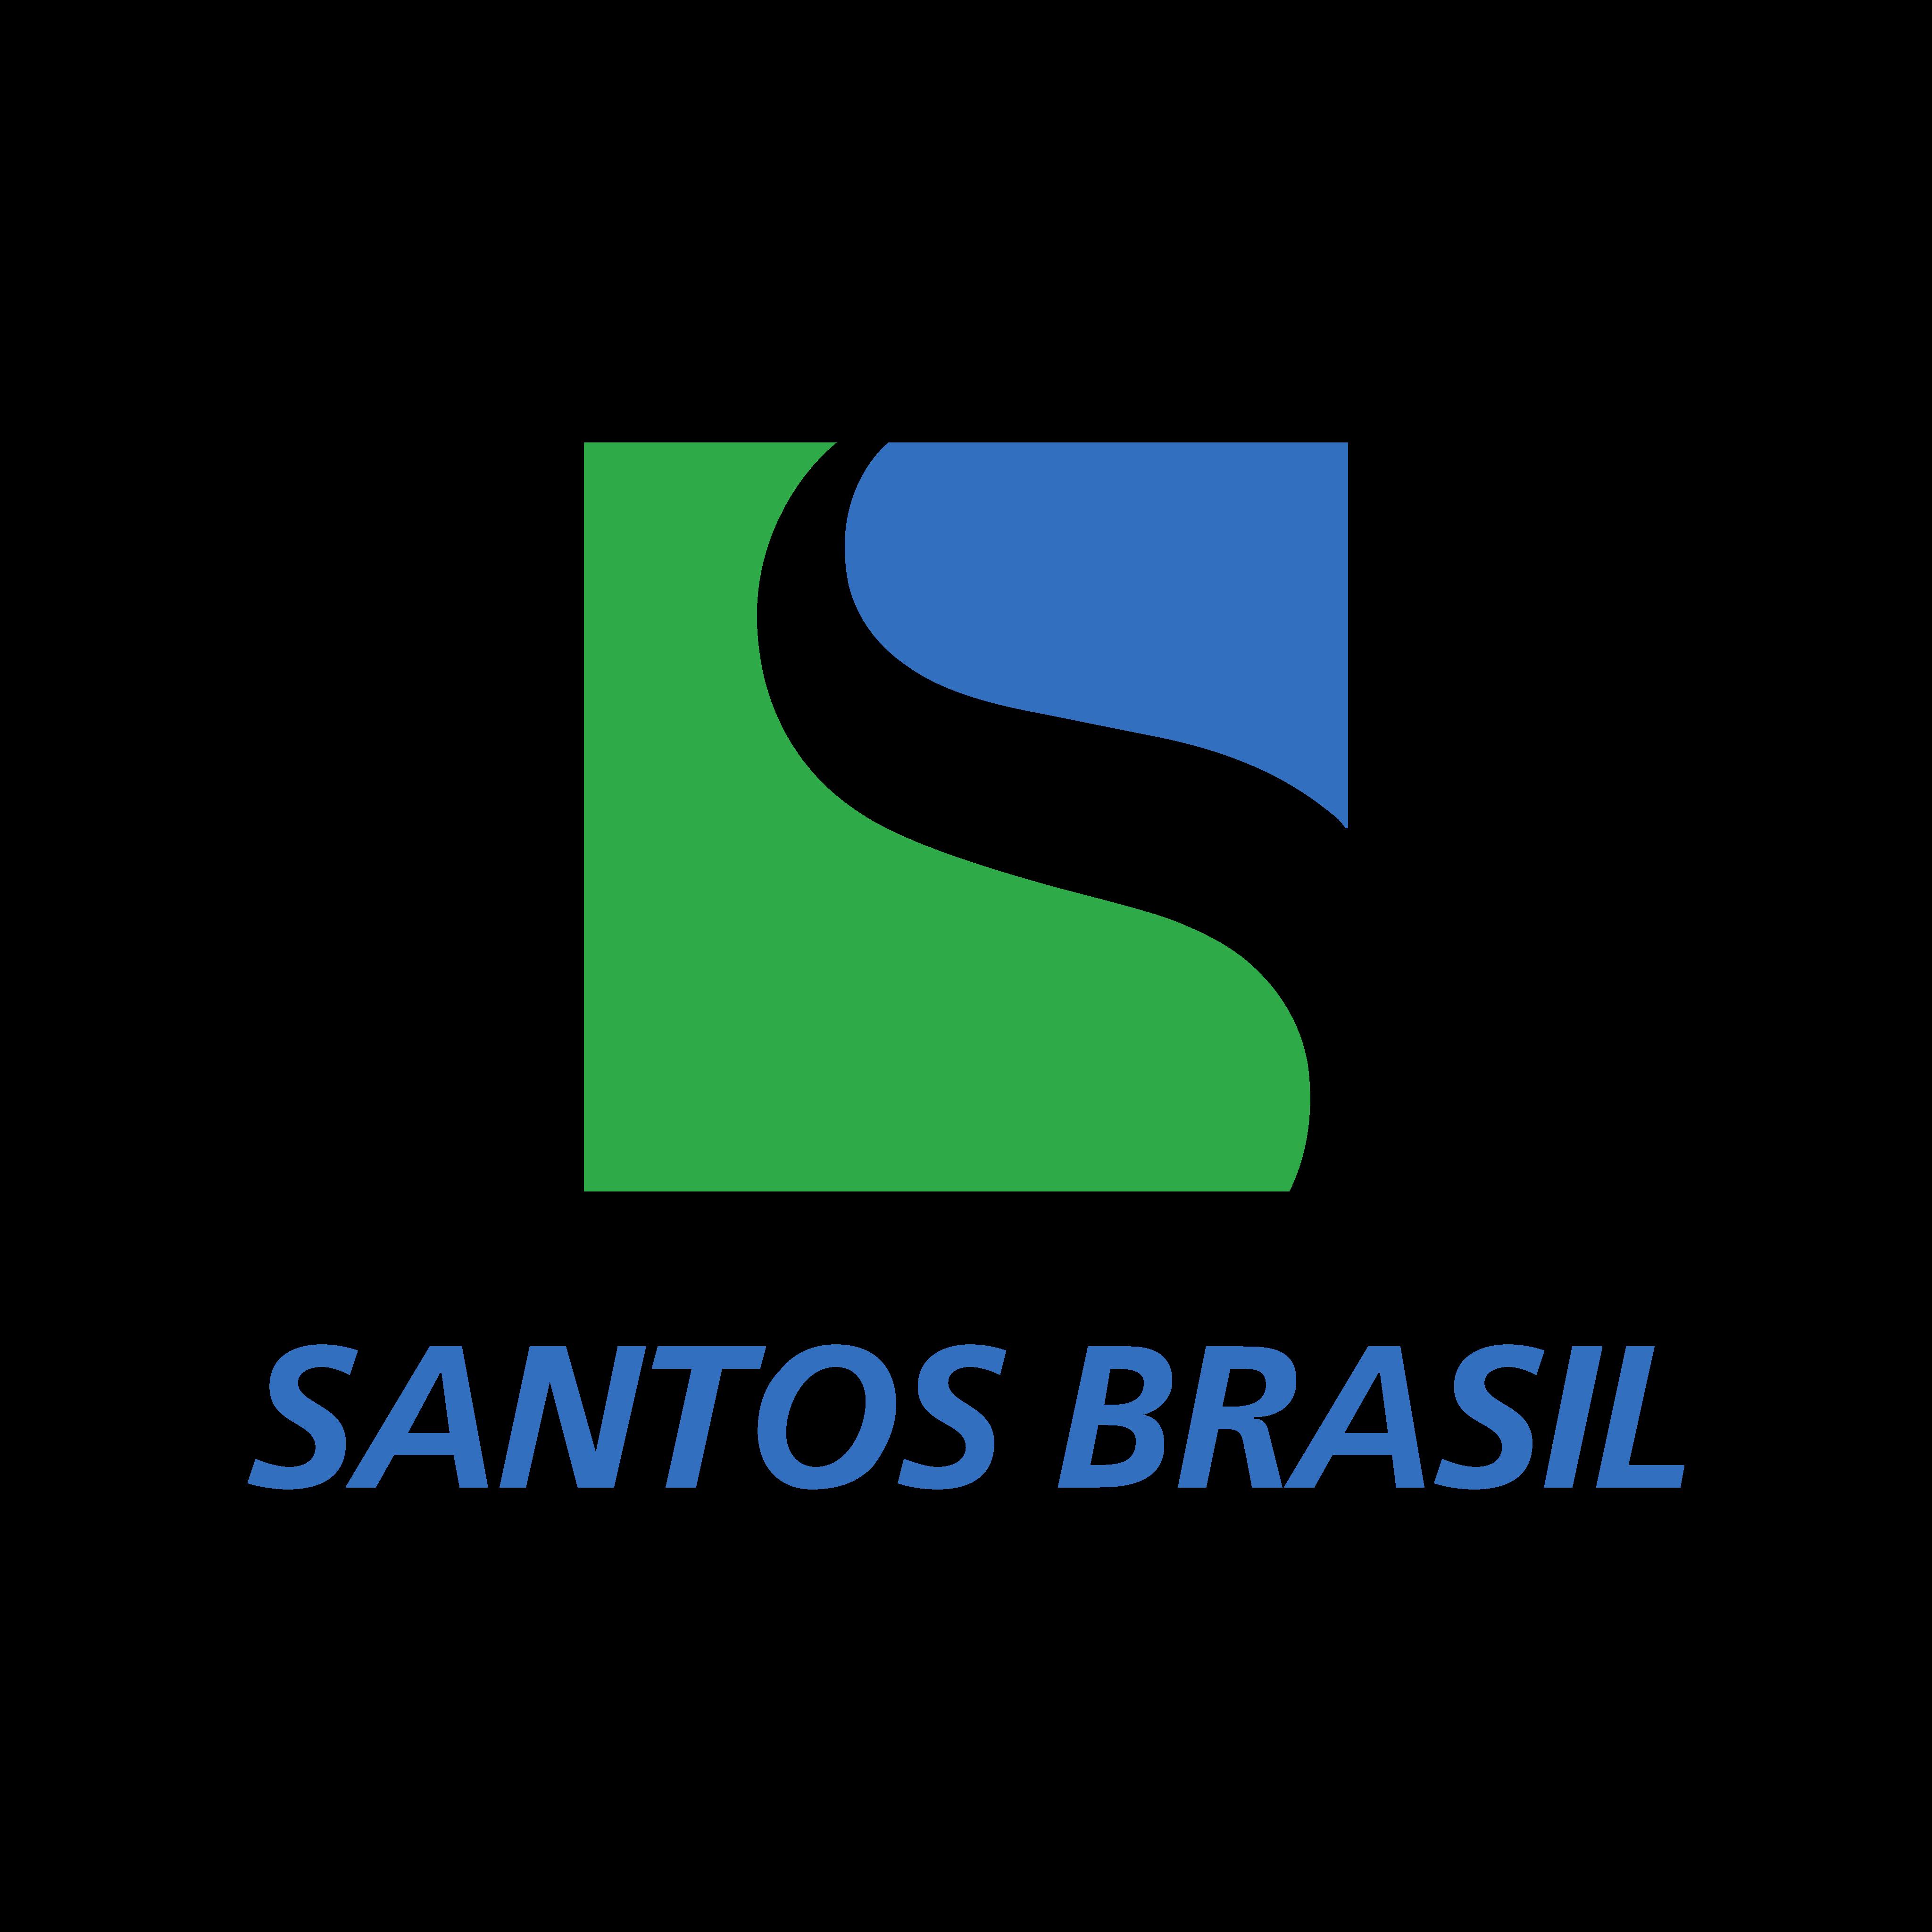 santos brasil logo 0 - Santos Brasil Logo